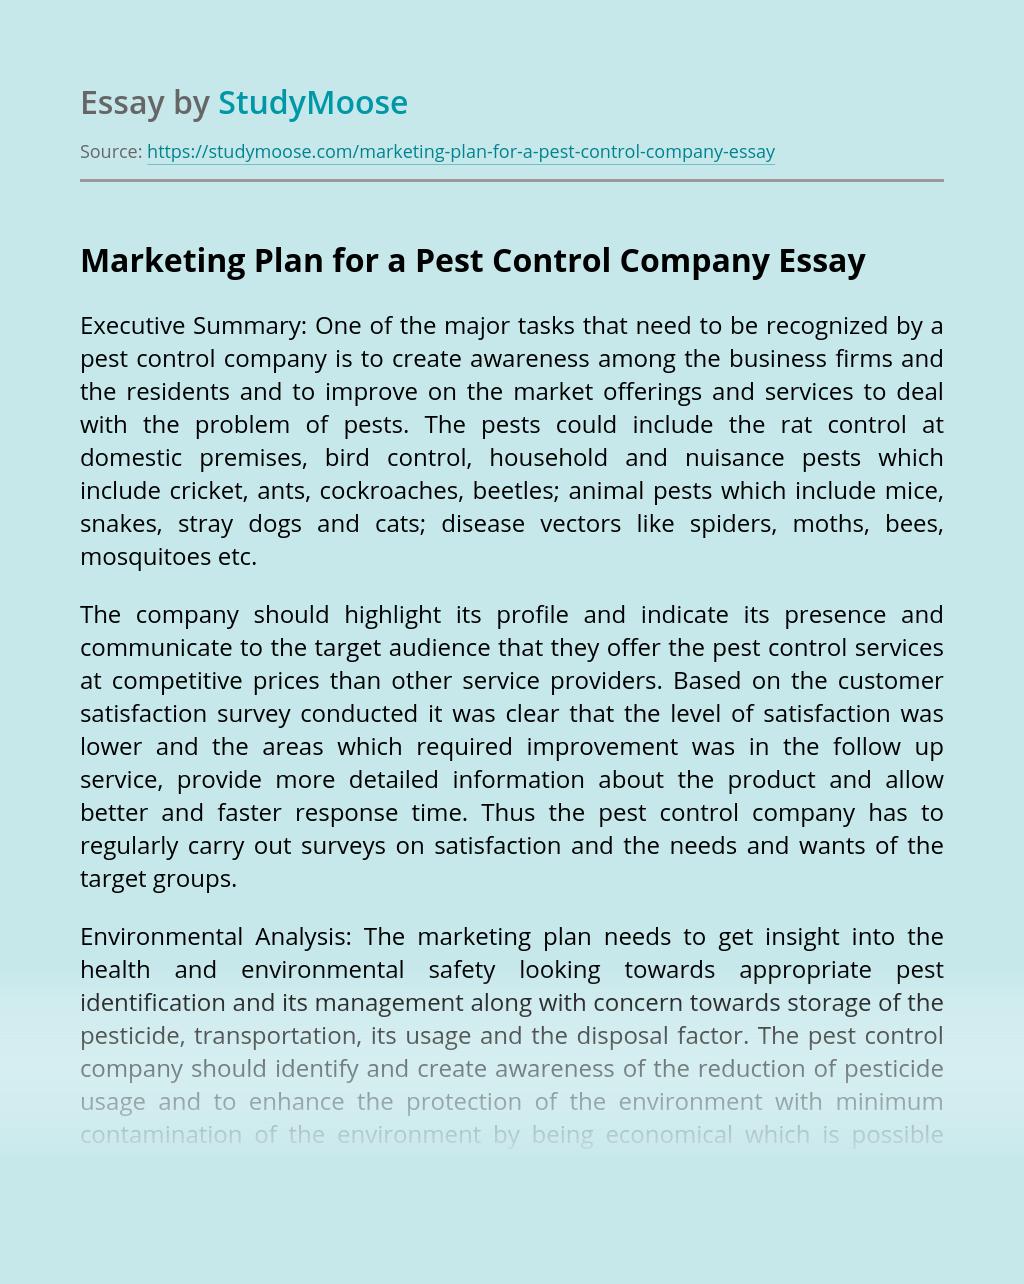 Marketing Plan for a Pest Control Company